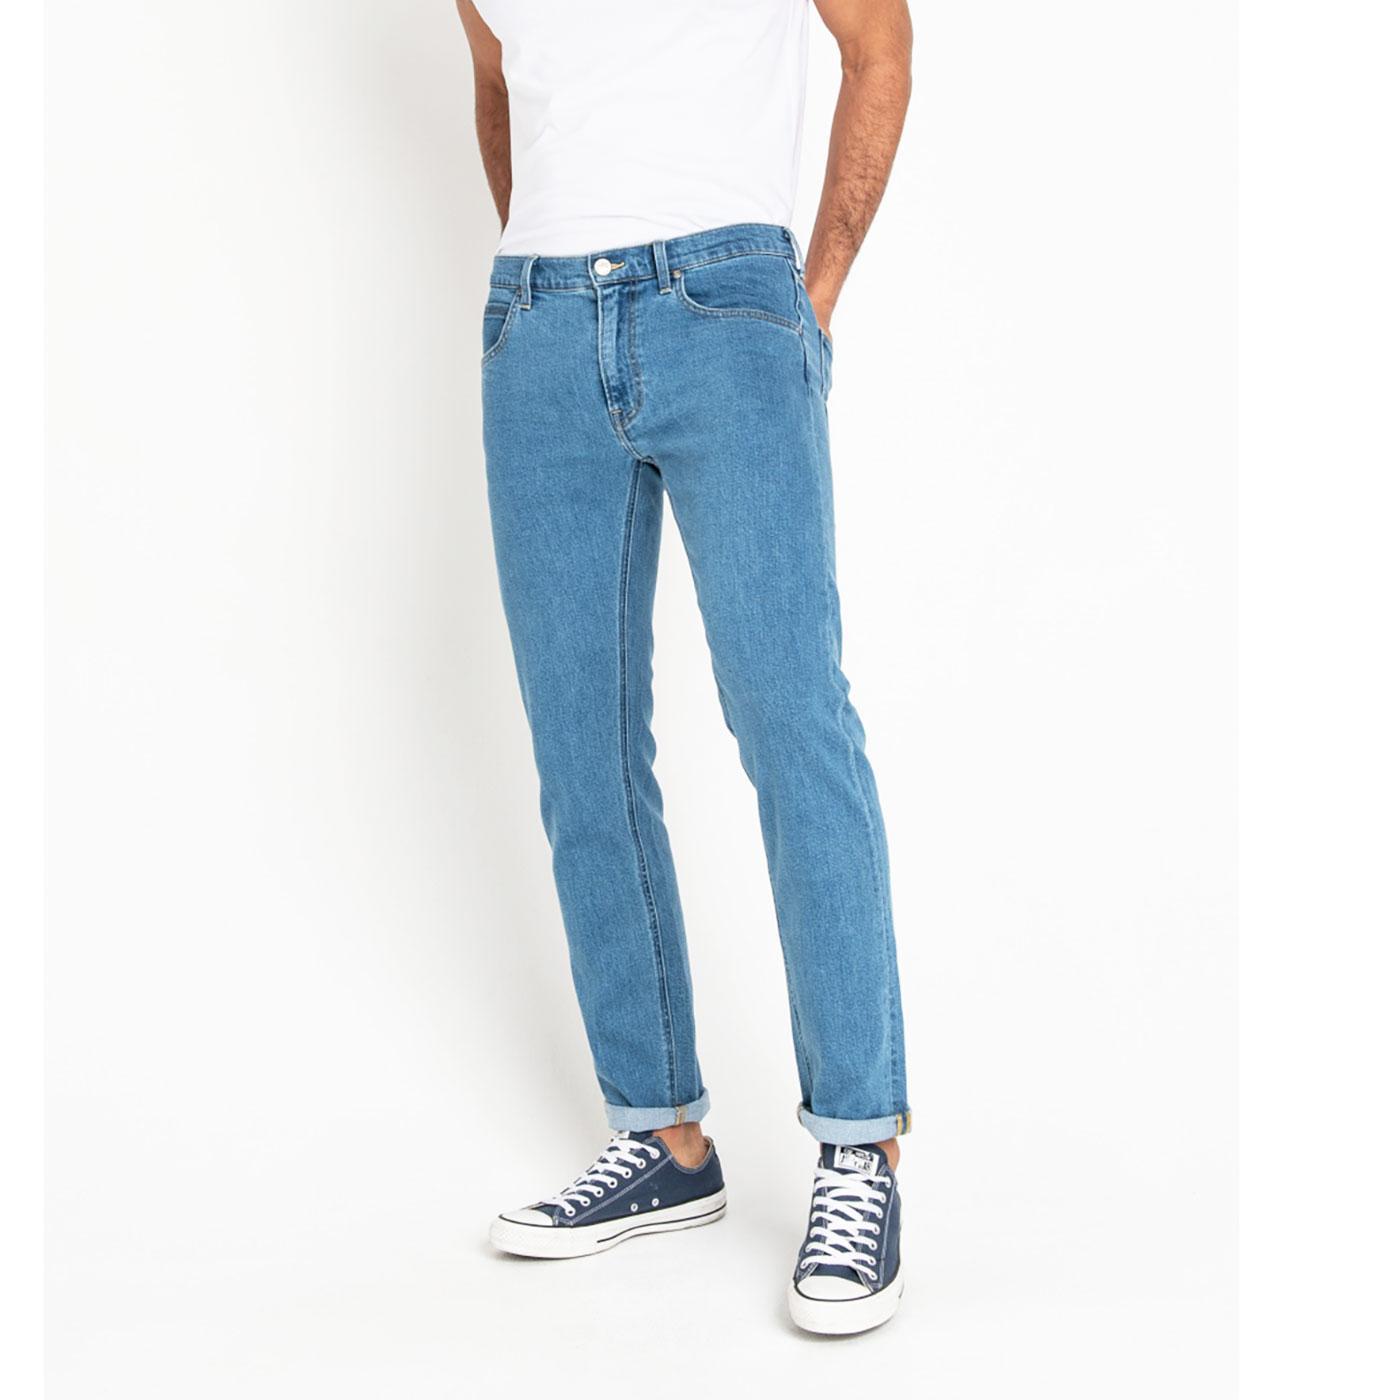 Daren LEE Regular Slim Mod Denim Jeans LIGHT STONE